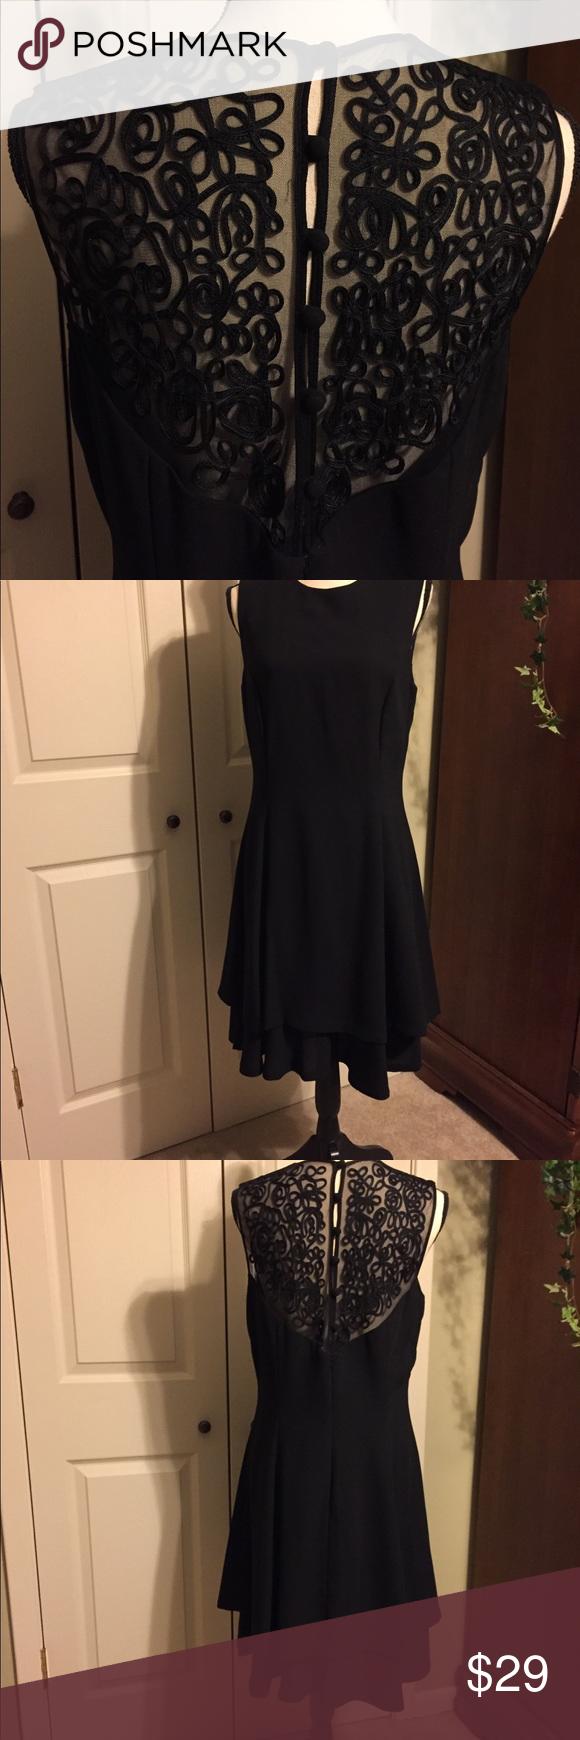 Beautiful Black Dress Size 12 Beautiful Black Dresses Dresses Colorful Dresses [ 1740 x 580 Pixel ]